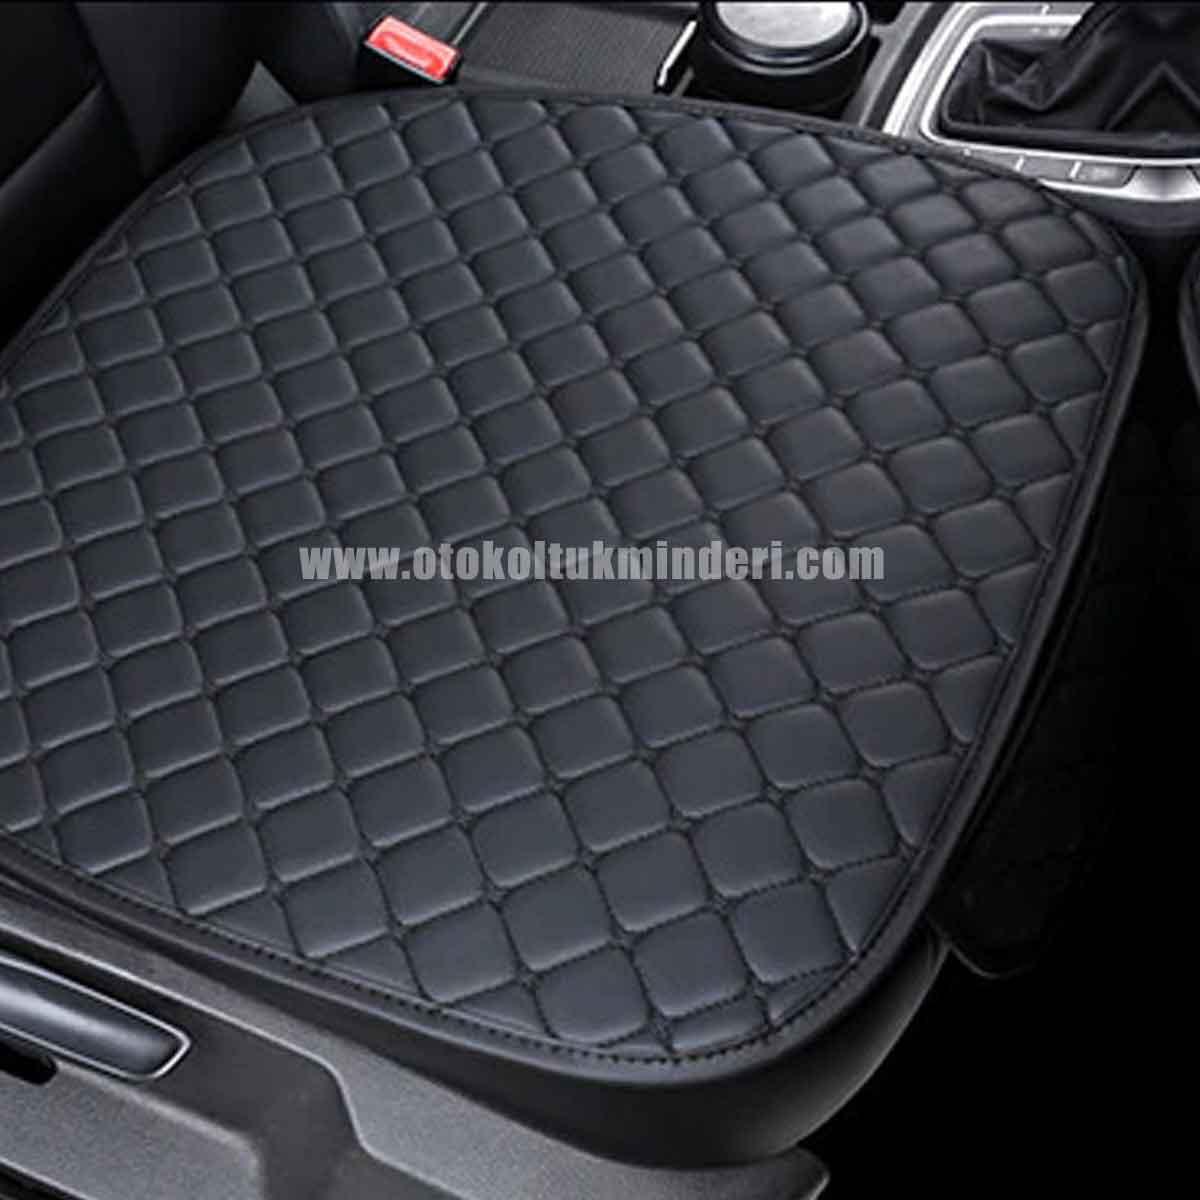 Toyota oto koltuk kılıfı - Toyota Koltuk minderi Siyah Deri Cepli